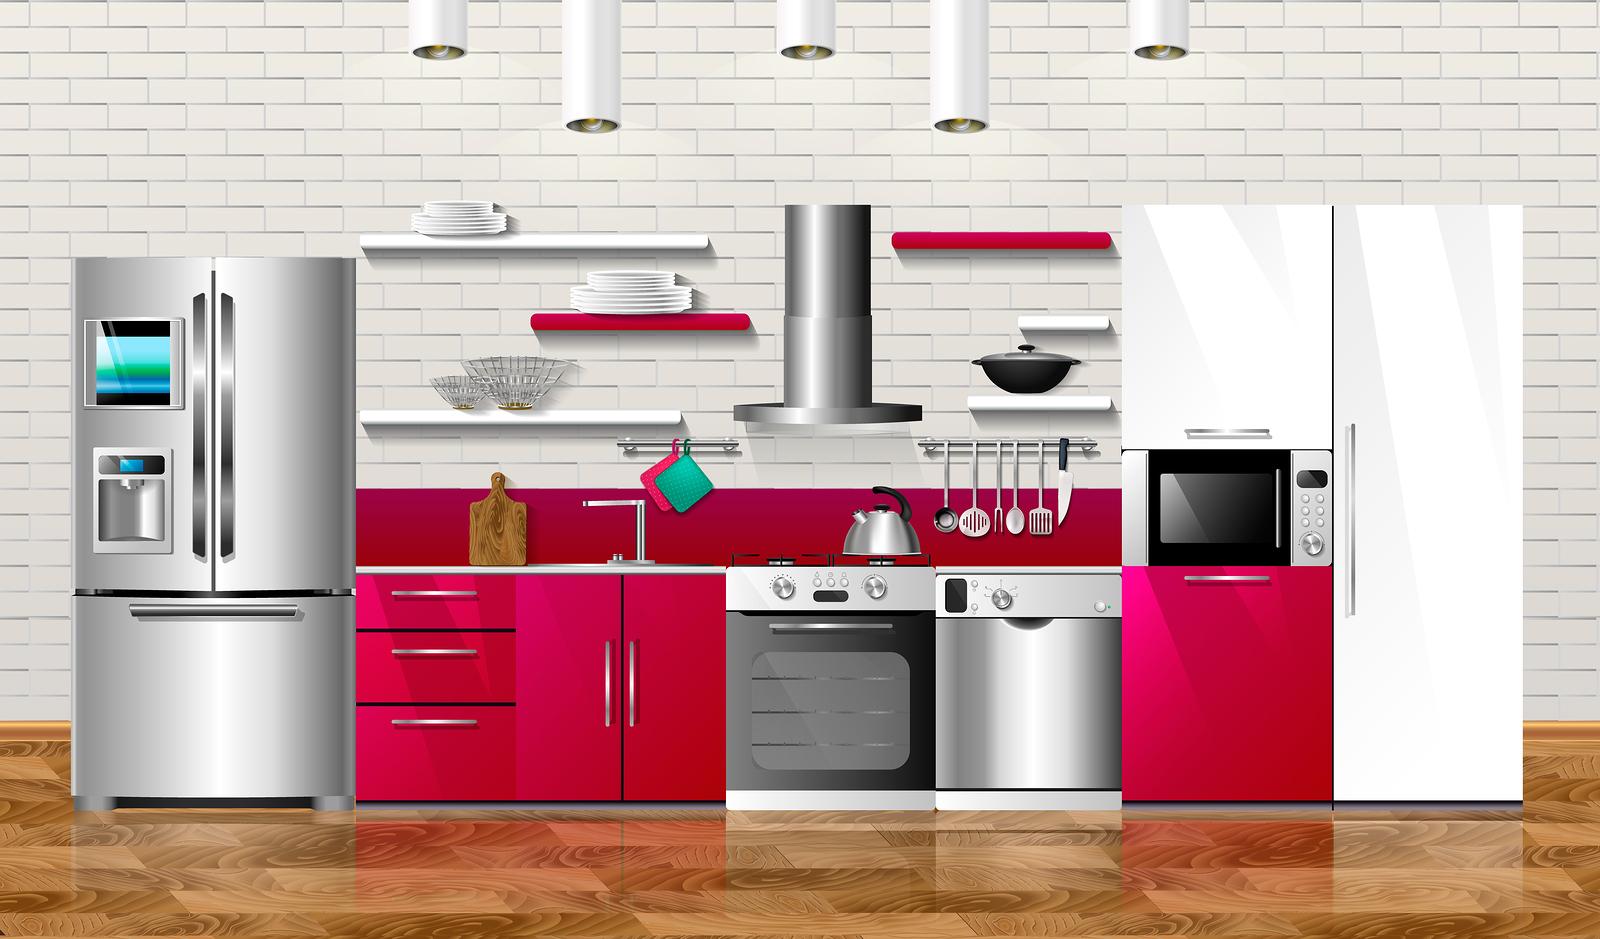 Appliance Repair Near Me (Cost & Service) -Checklist ...